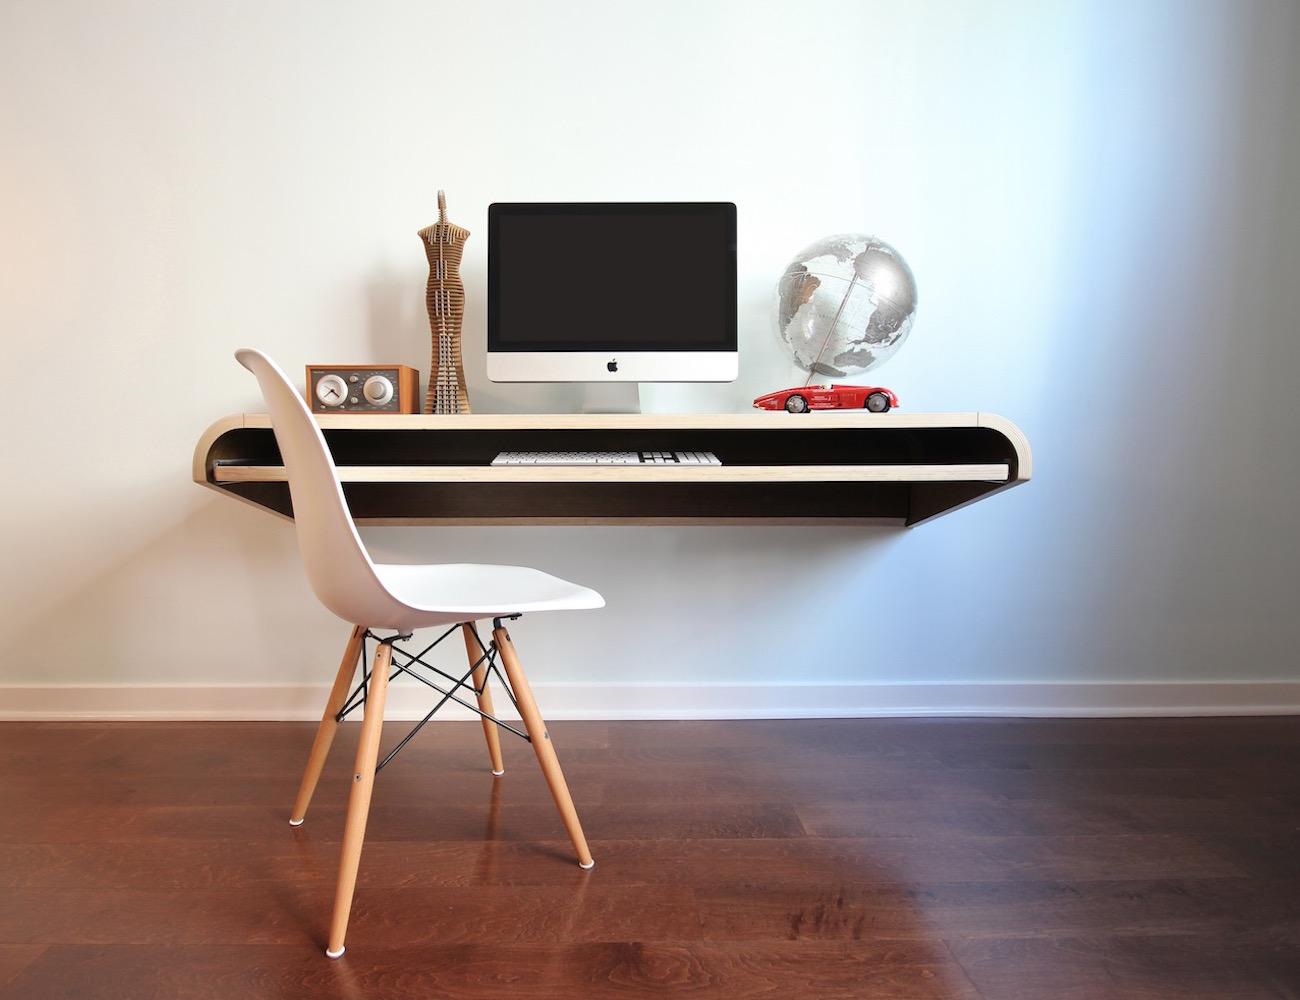 Minimal+Float+Wall+Desk+by+Orange22+%26%238211%3B+Multi+Use+Workstation+or+Display+Shelf